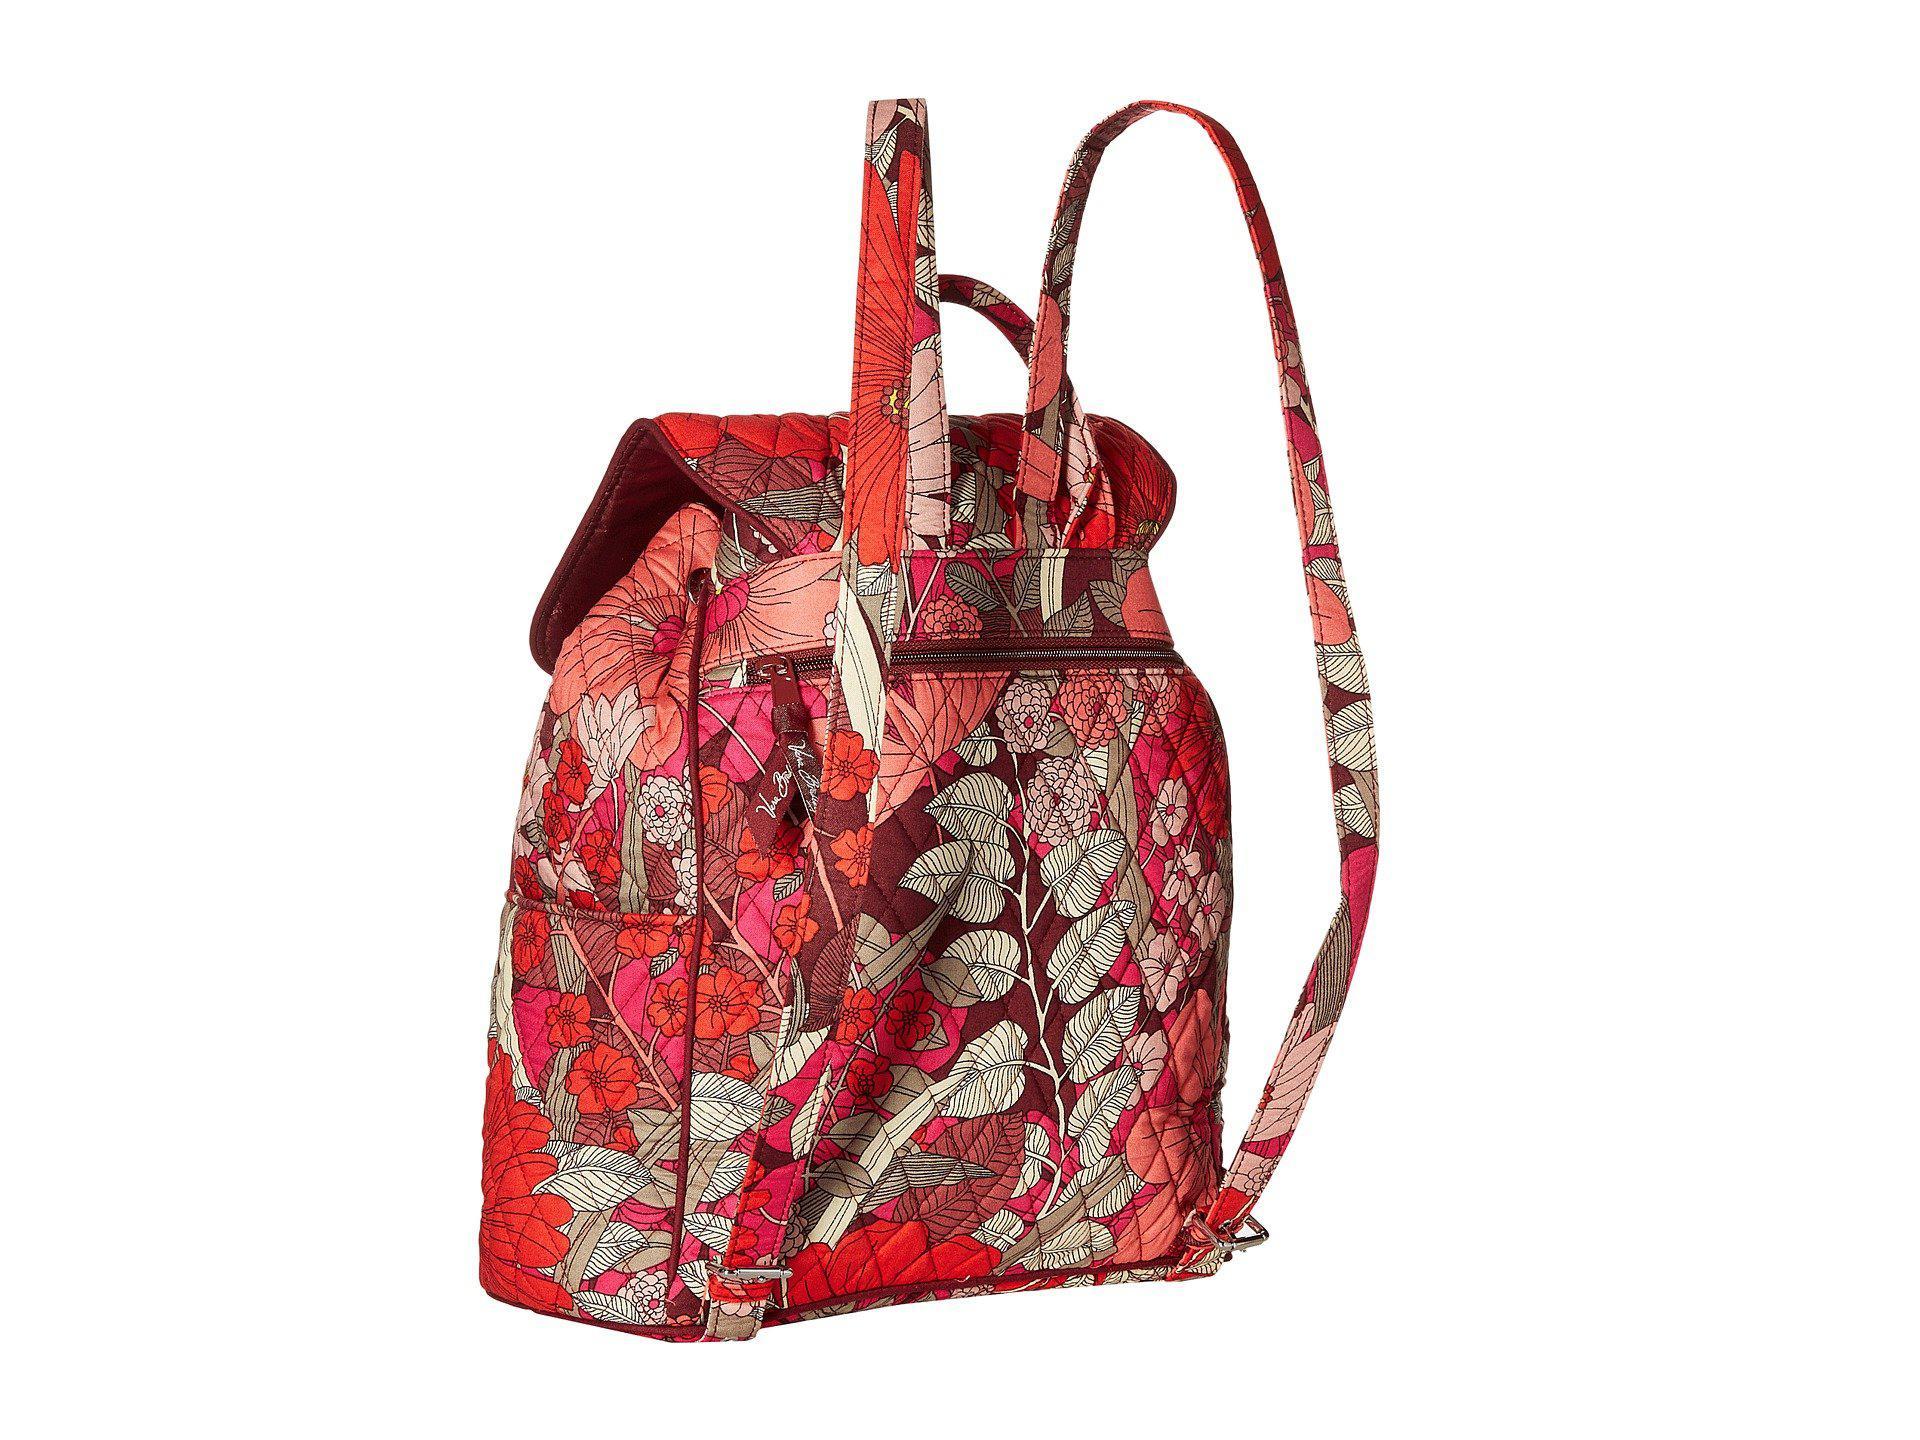 7c2207ccc2 Vera Bradley - Red Drawstring Backpack - Lyst. View fullscreen